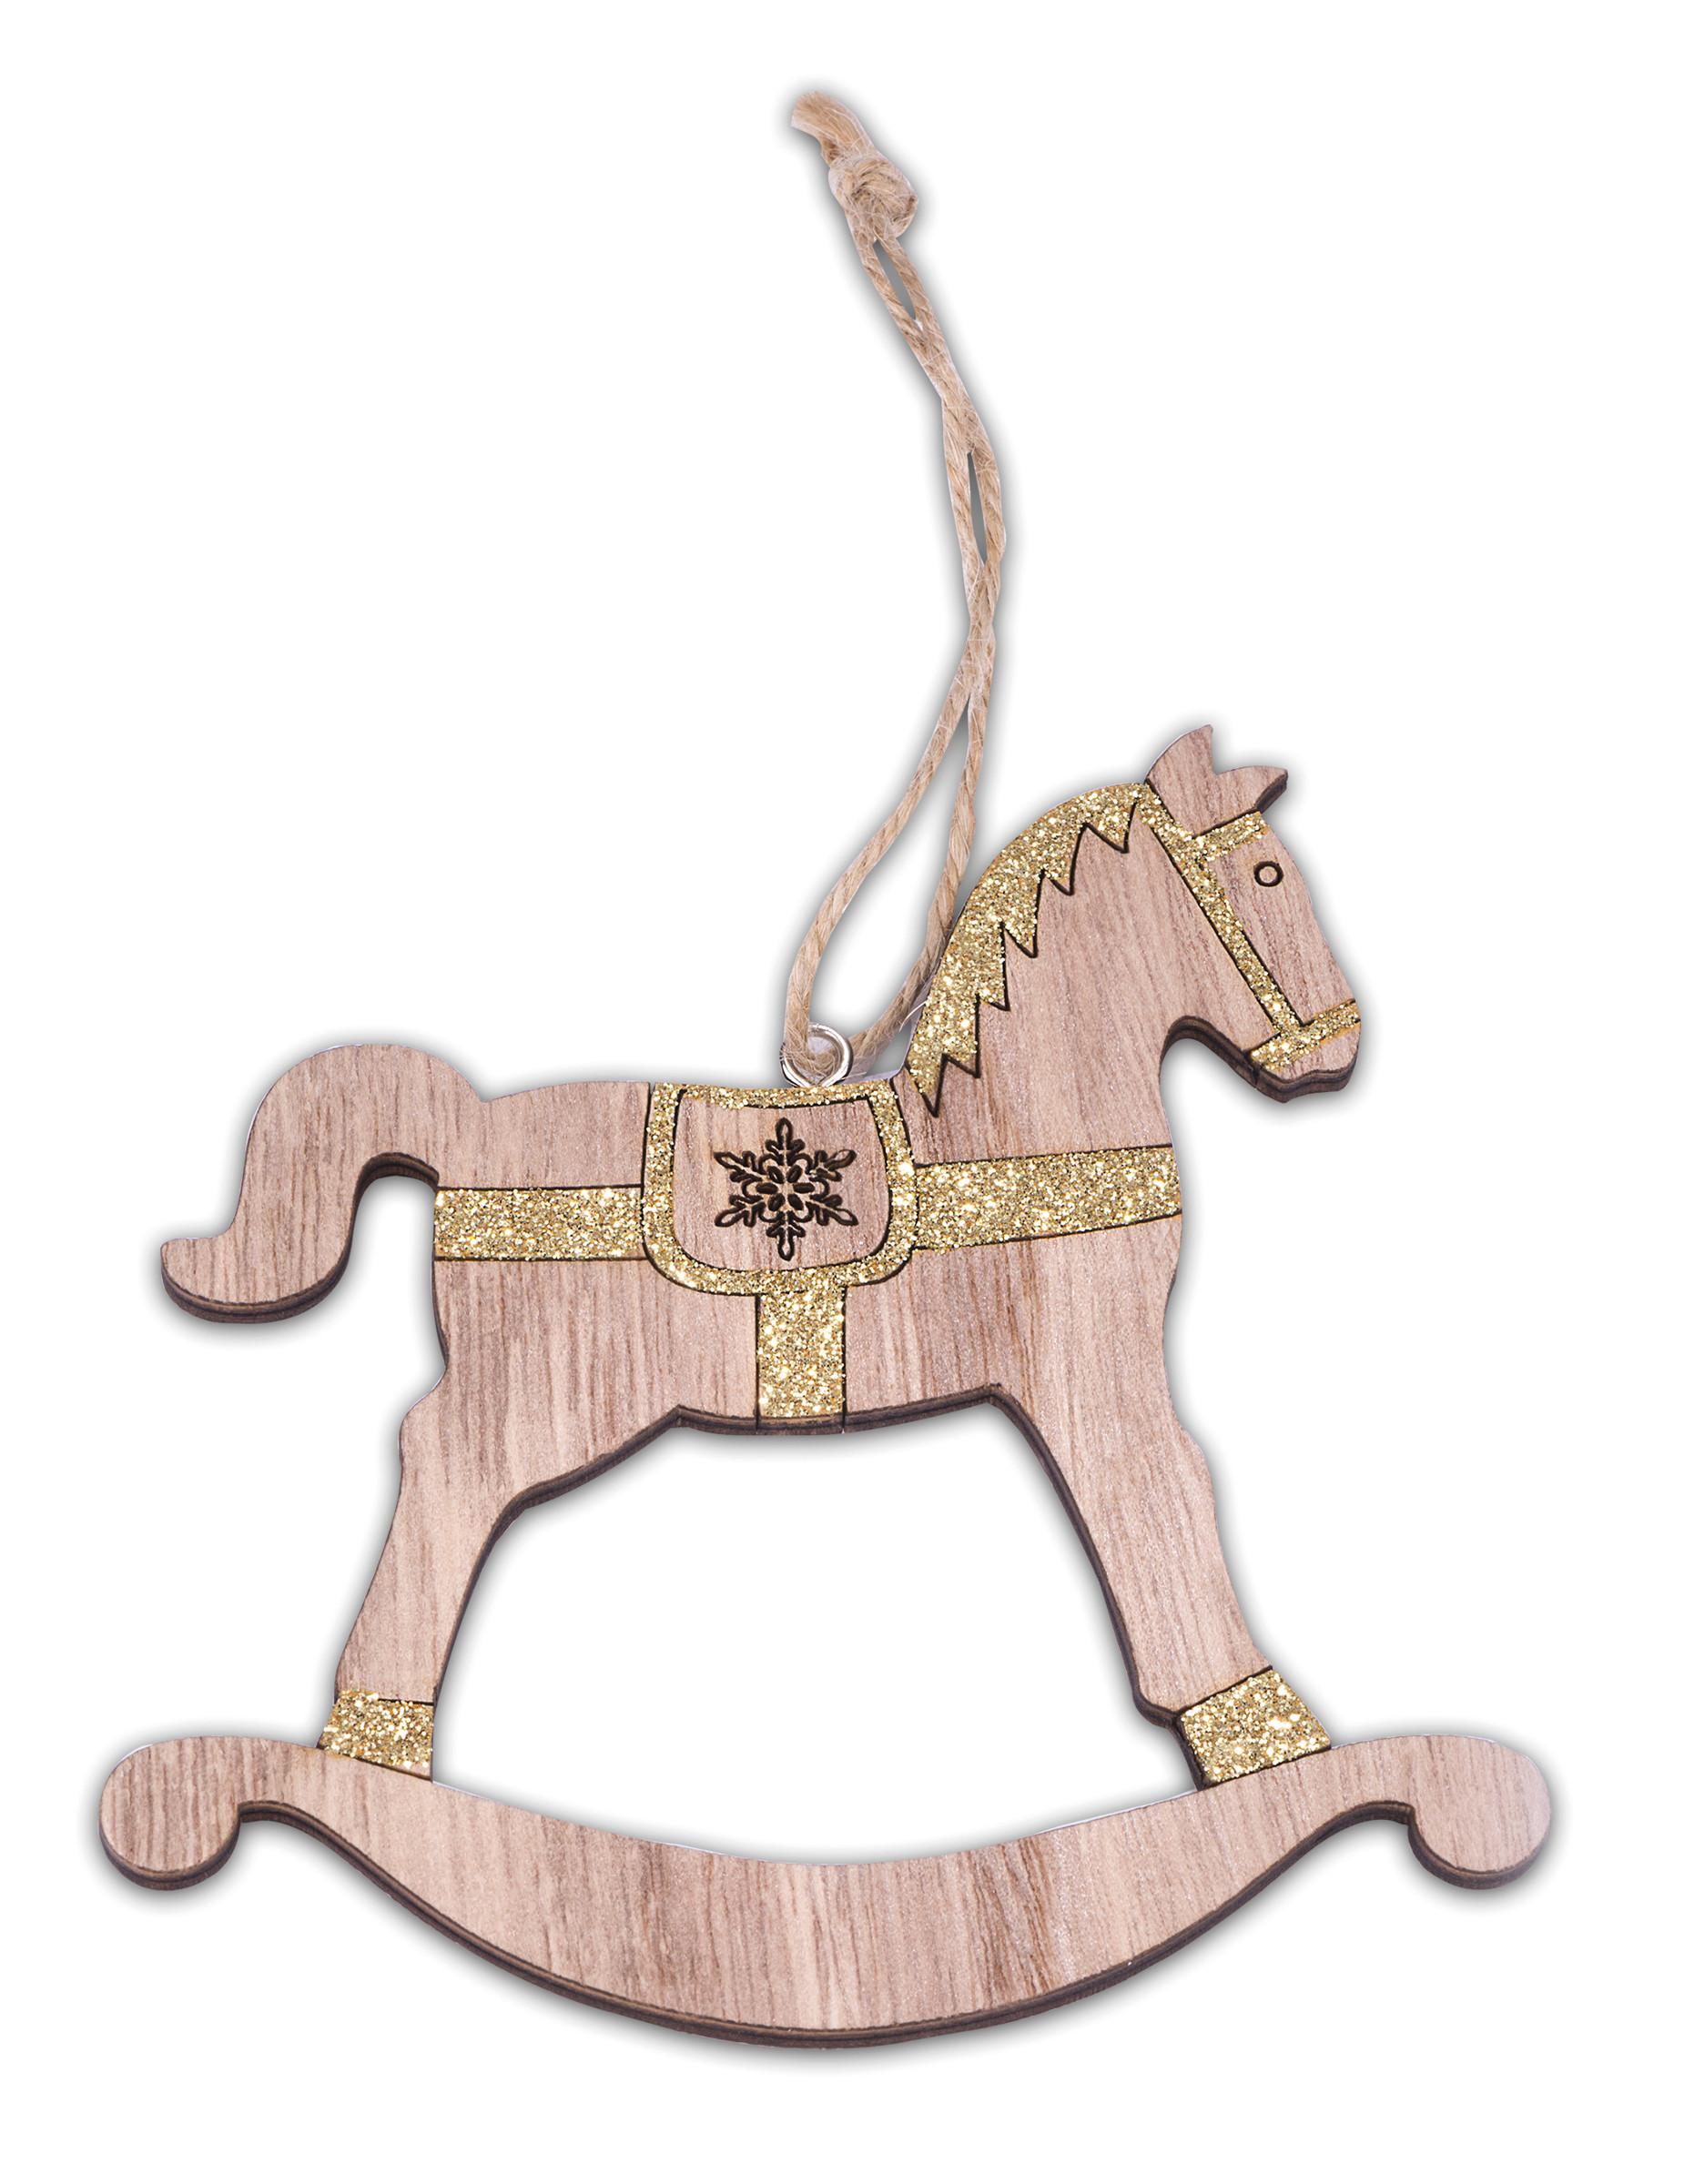 cheval bascule en bois paillet dor 12 cm d coration. Black Bedroom Furniture Sets. Home Design Ideas